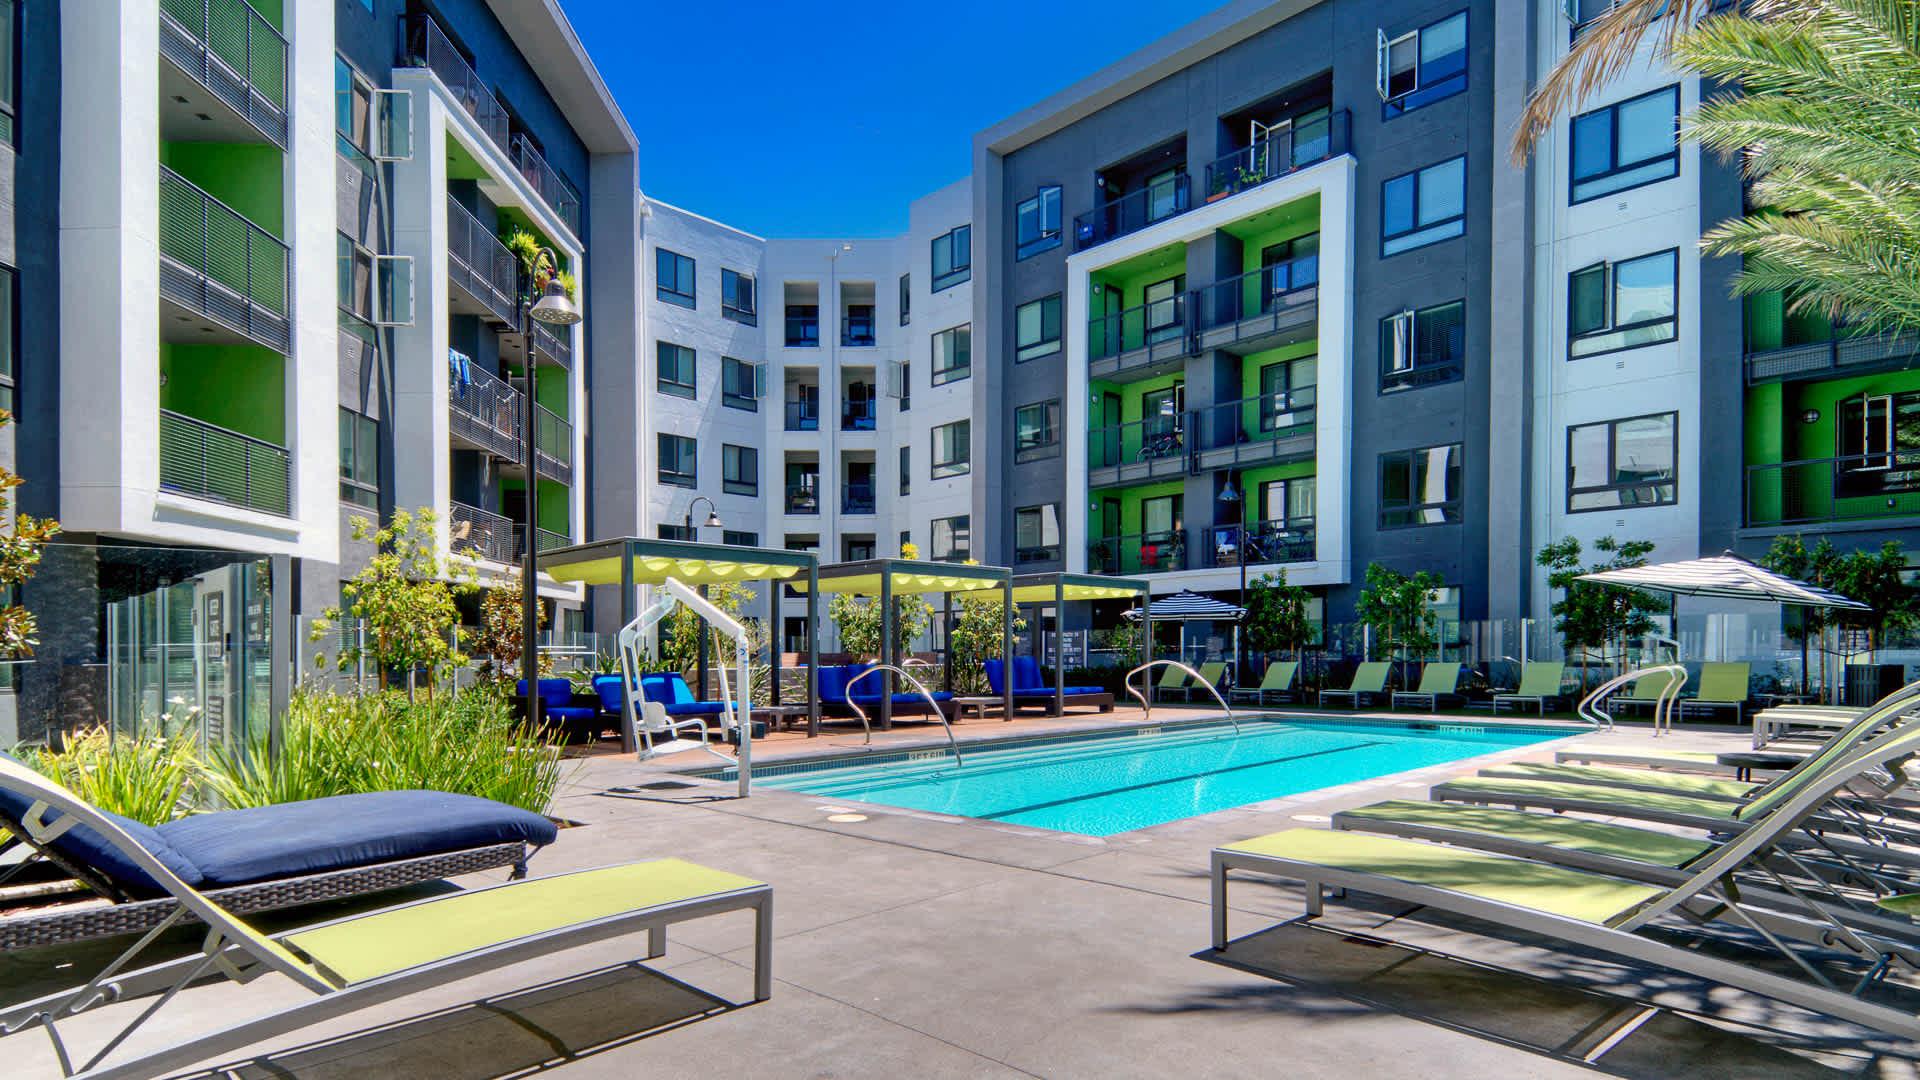 The Lex Short Term Rental-Sample Image of San jose CA Furnished Intern Rental